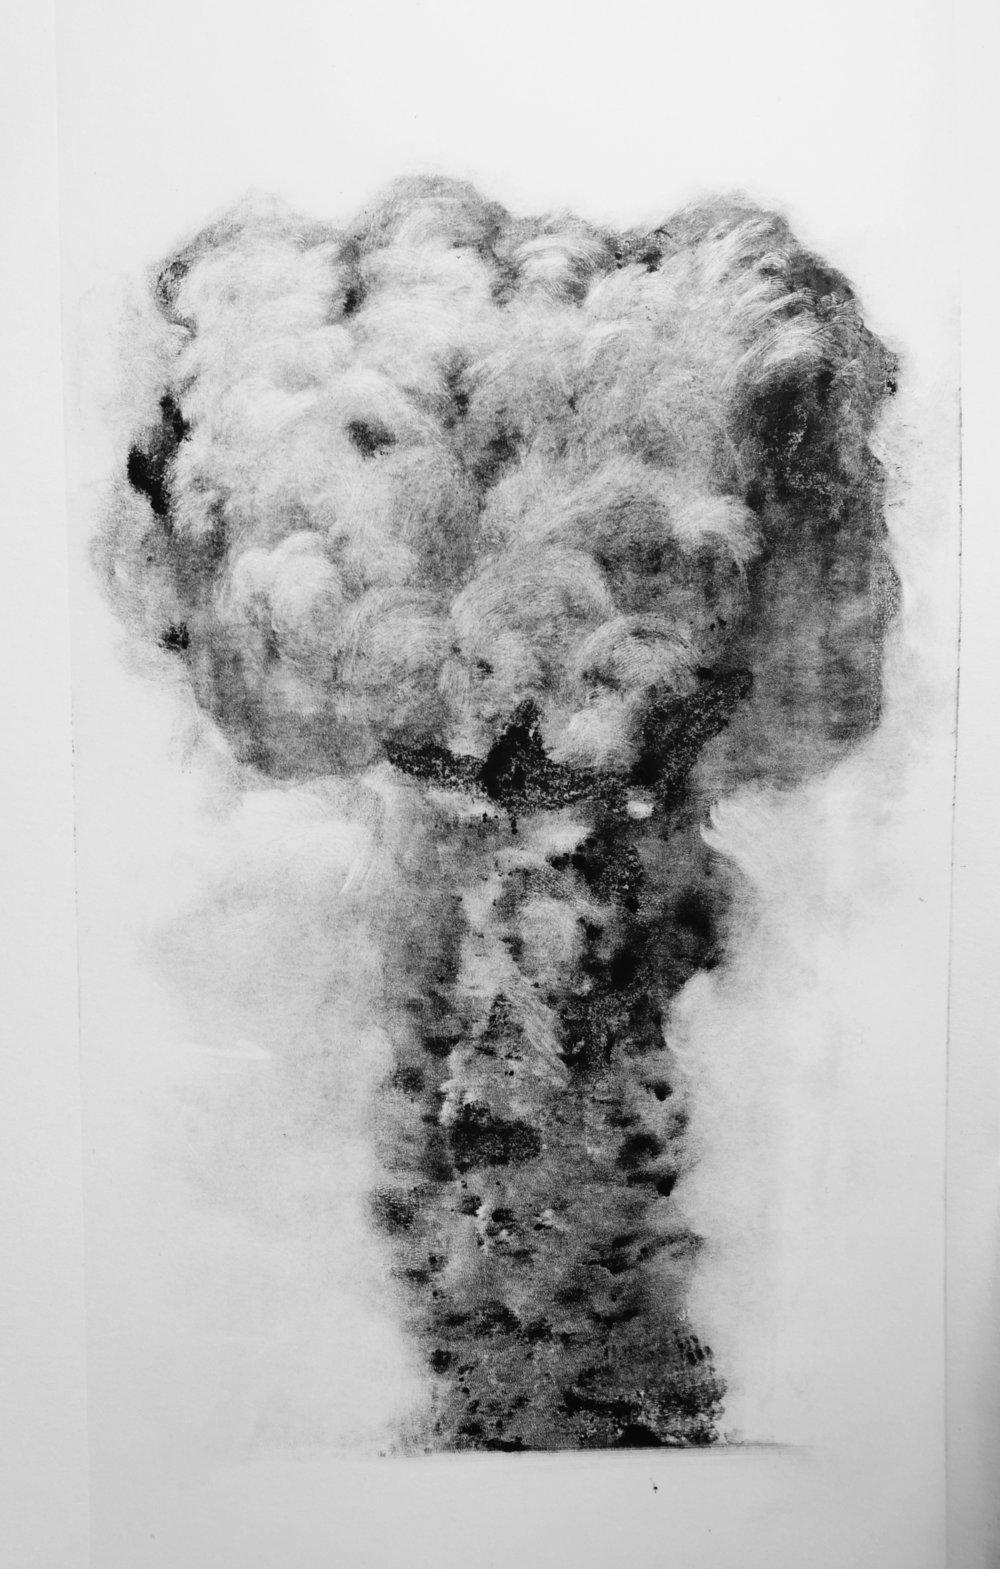 Smoke XI